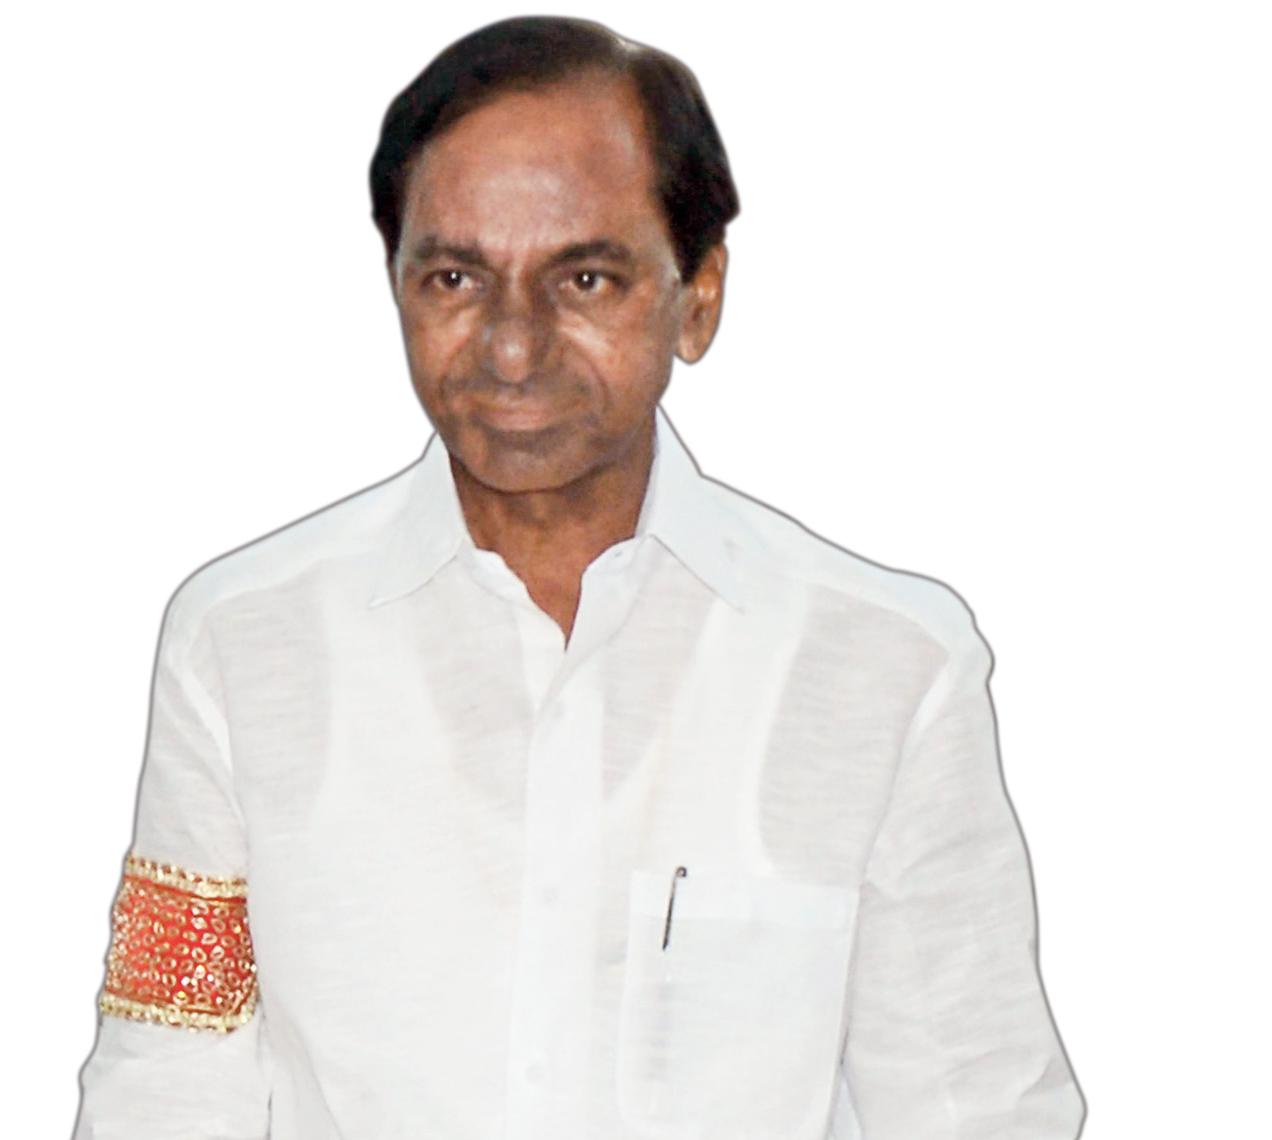 K. Chandrashekhar Rao